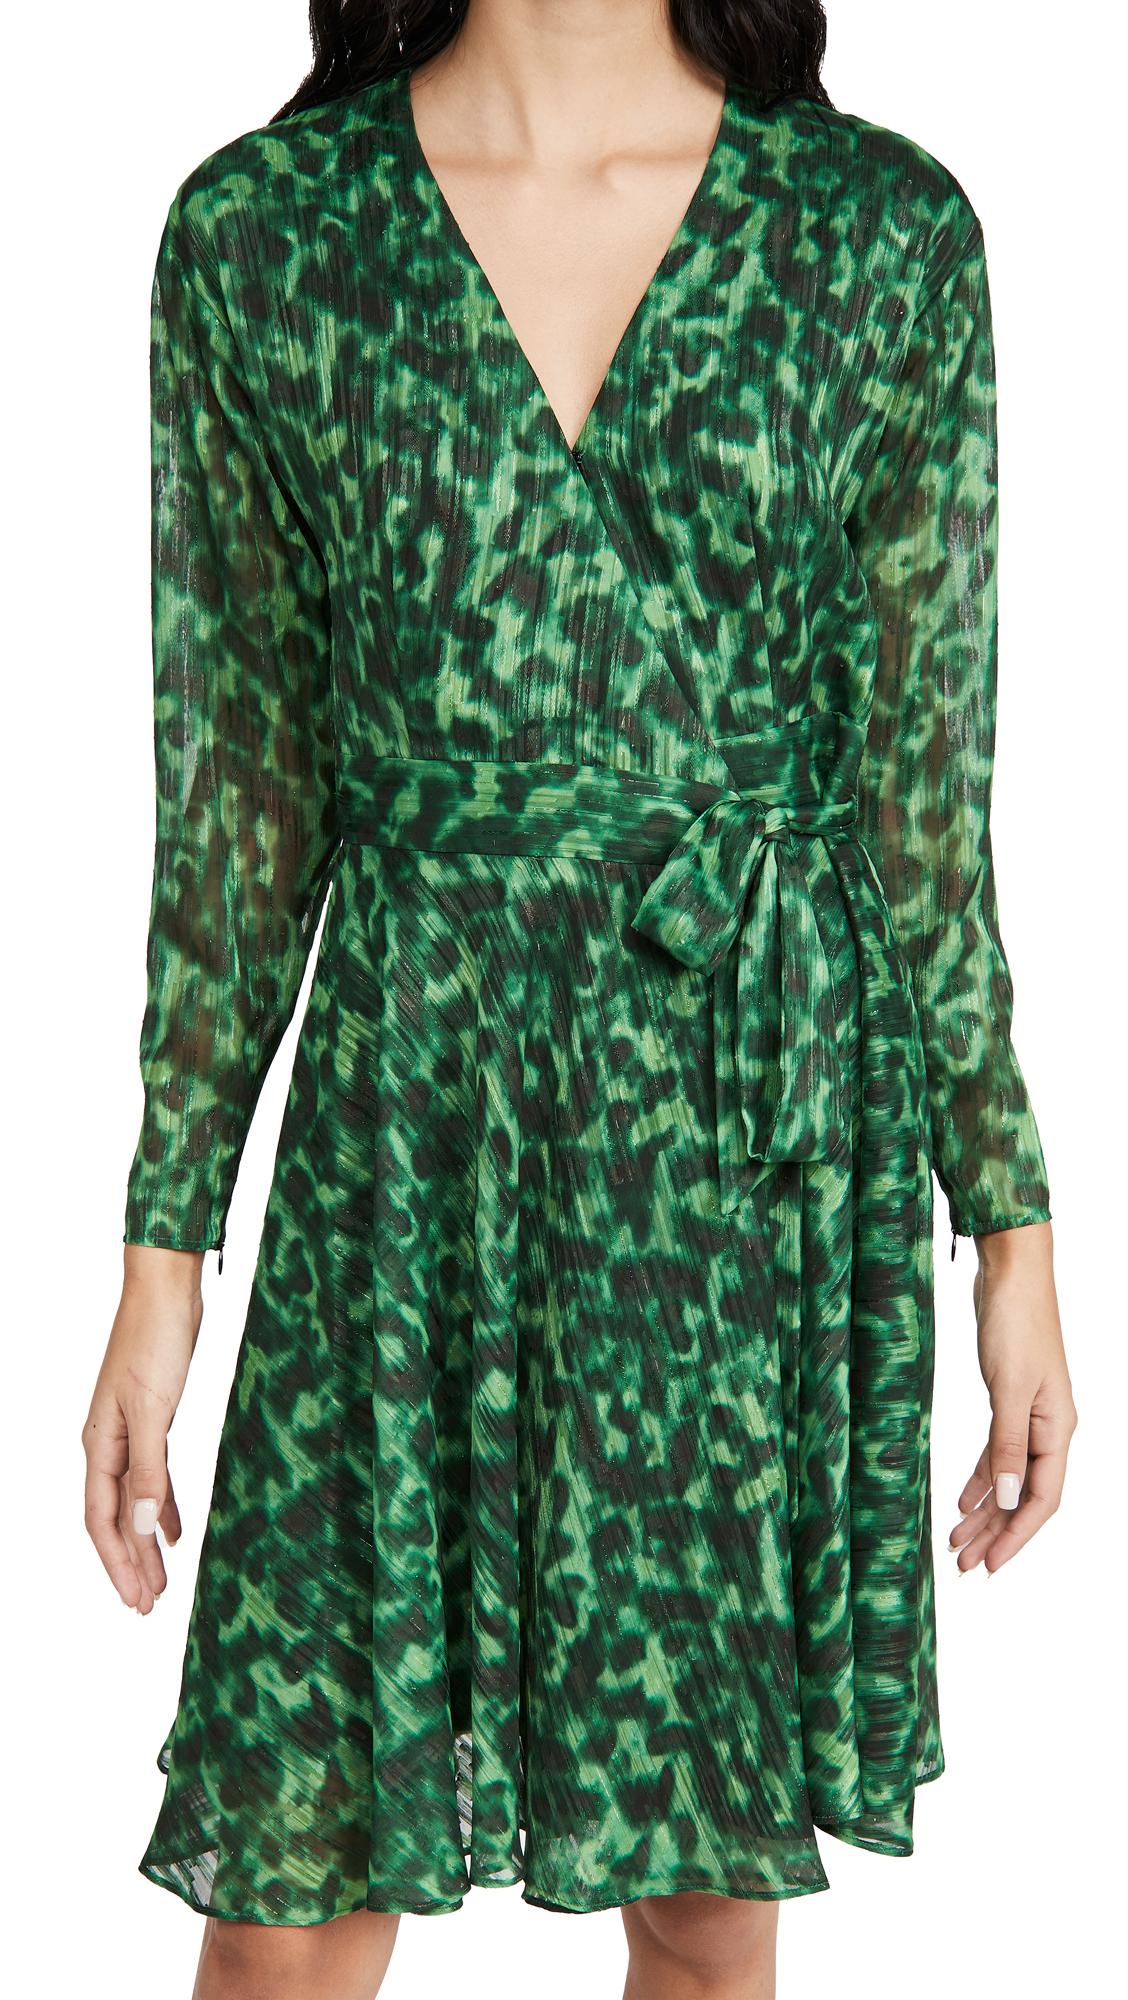 Marchesa Notte Printed Long Sleeve Dress